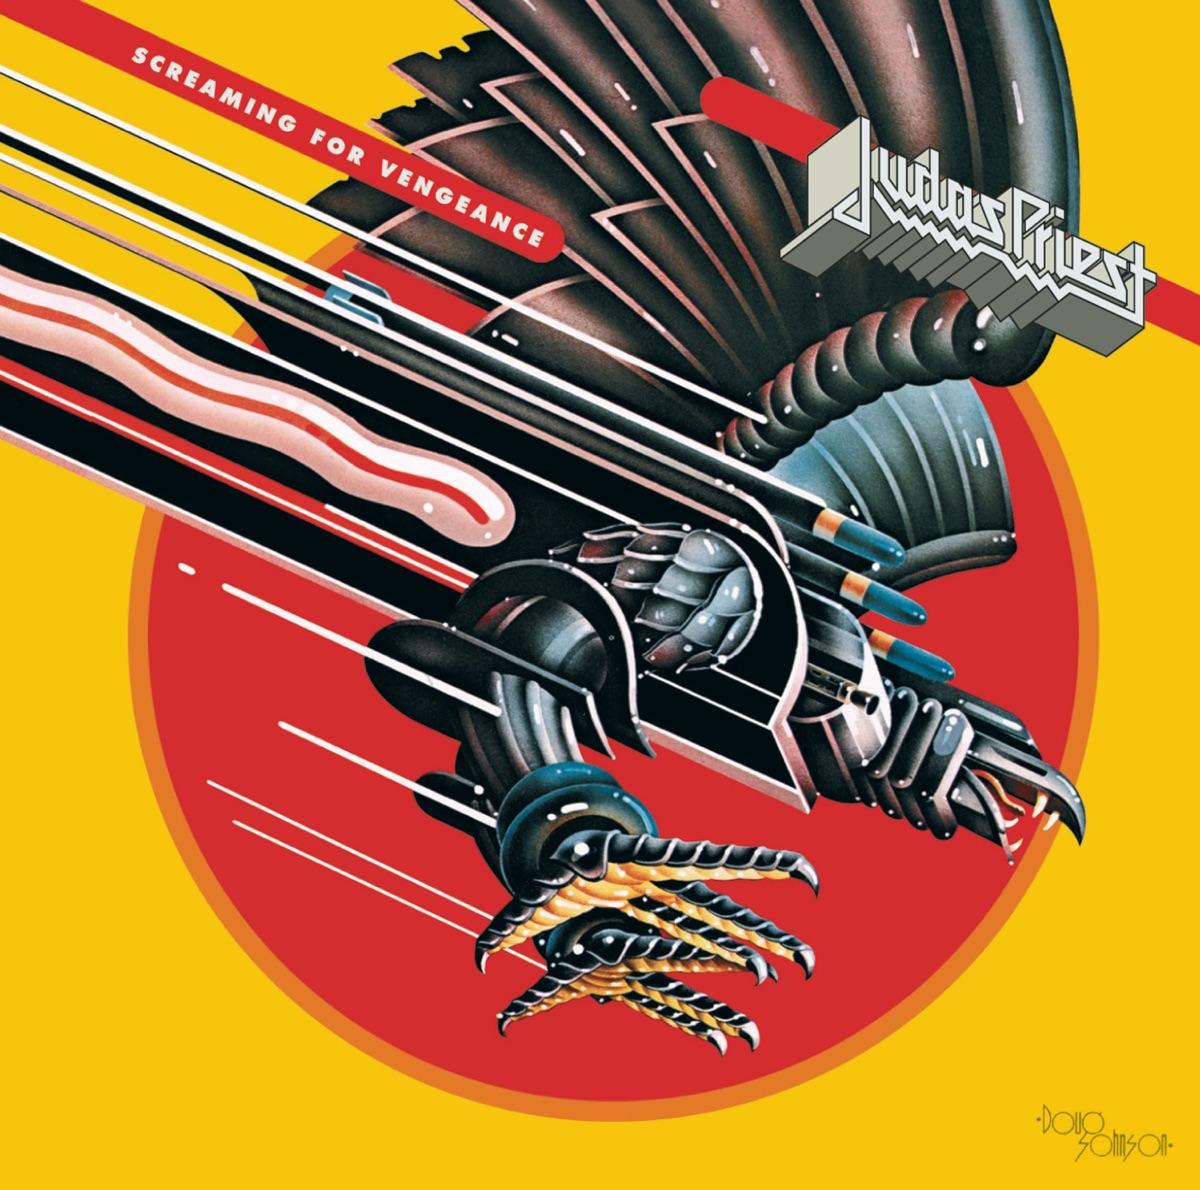 Screaming for Vengeance Judas Priest CD cover